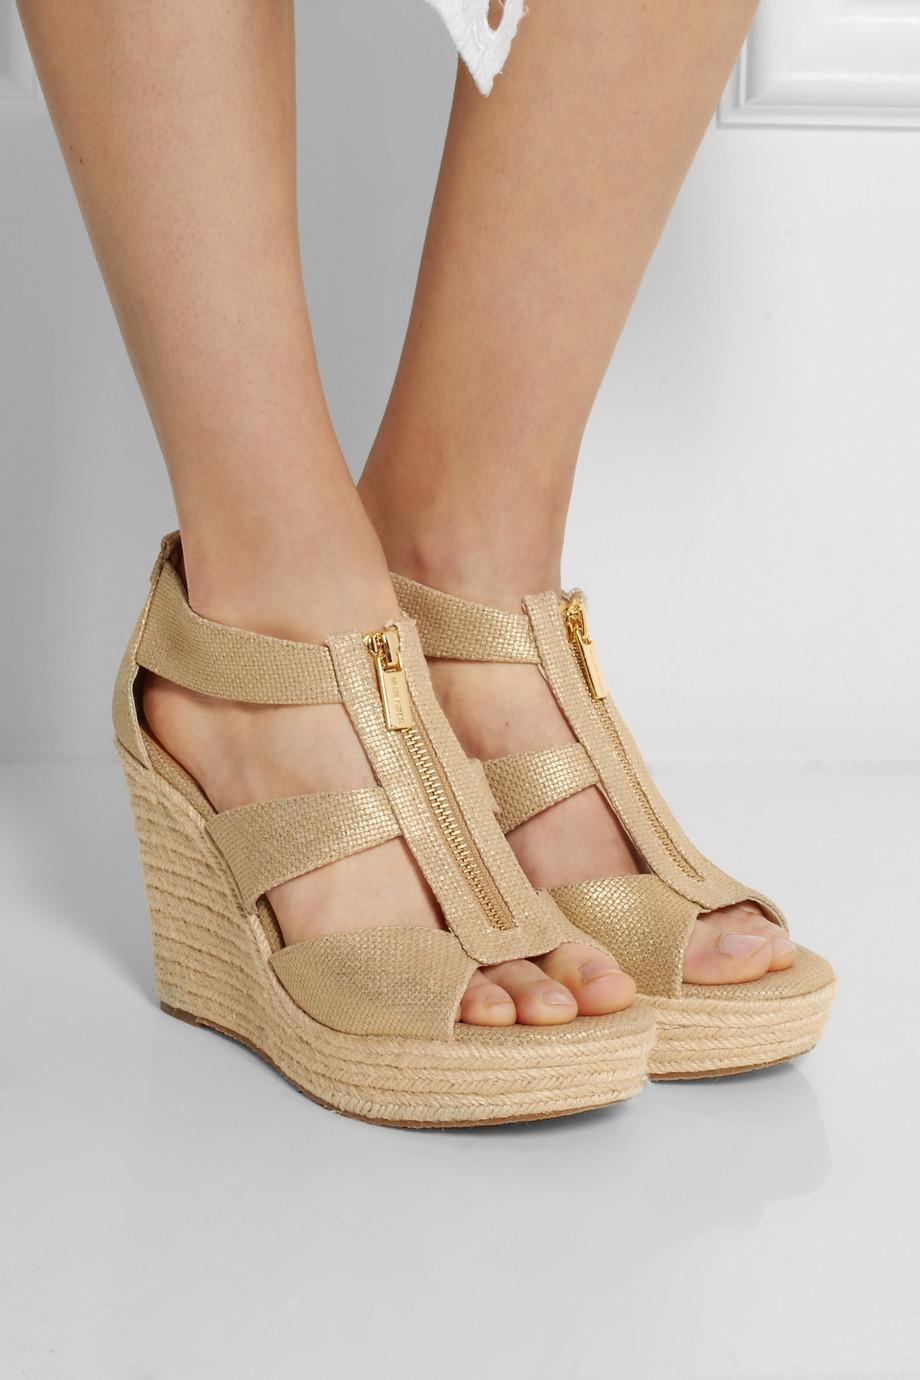 6a1039bdd95 MICHAEL Michael Kors Damita Metallic Canvas Wedge Sandals in ...